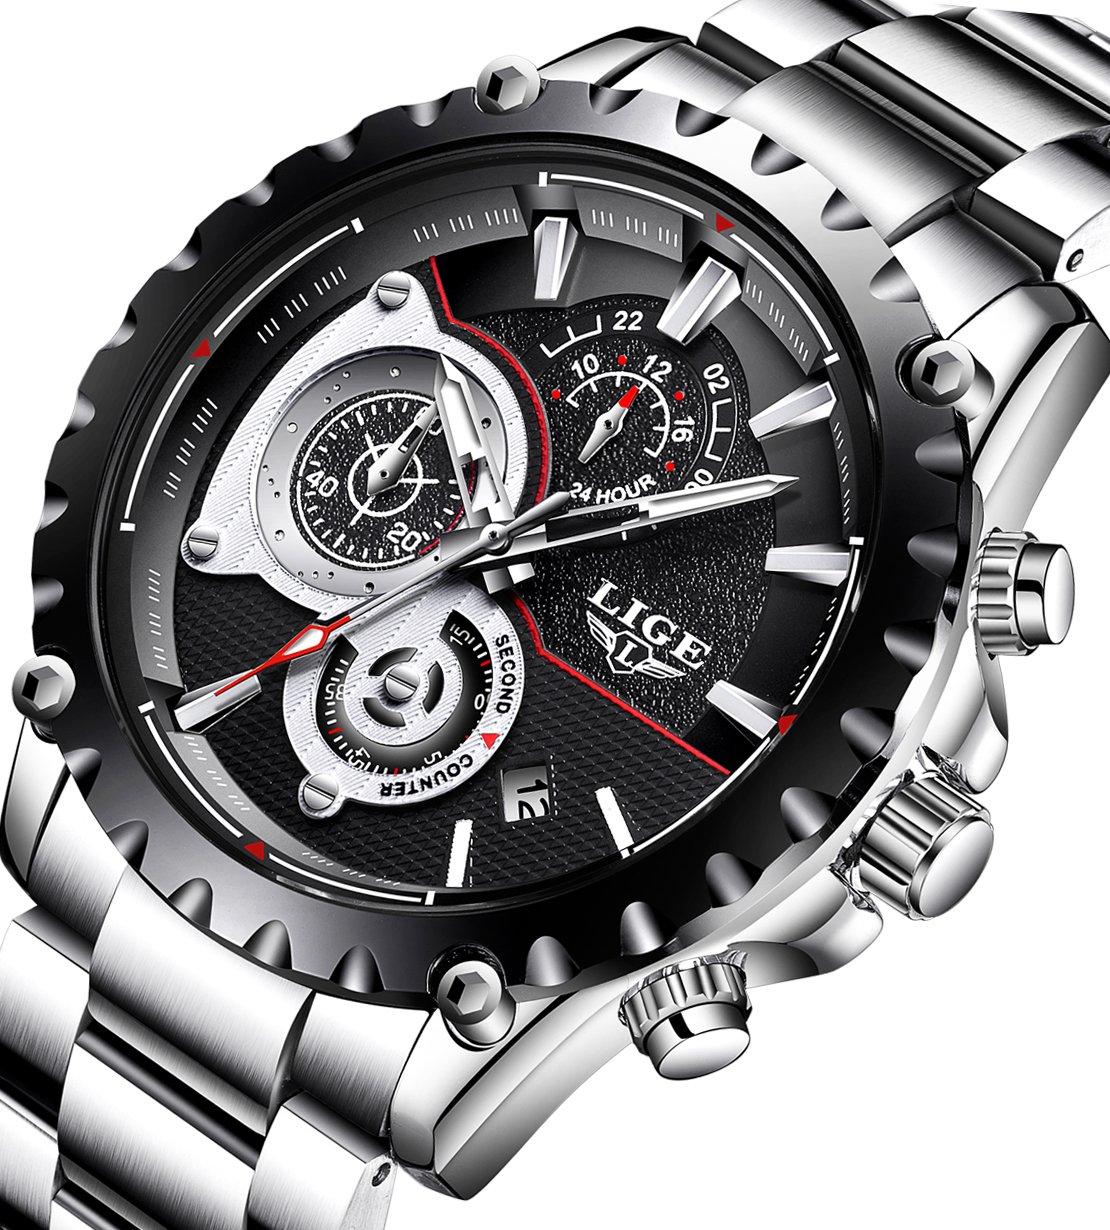 Mens Watches Full Steel Waterproof Sport Analog Quartz Watch Men Chronograph Business Black Wristwatch by LIGE